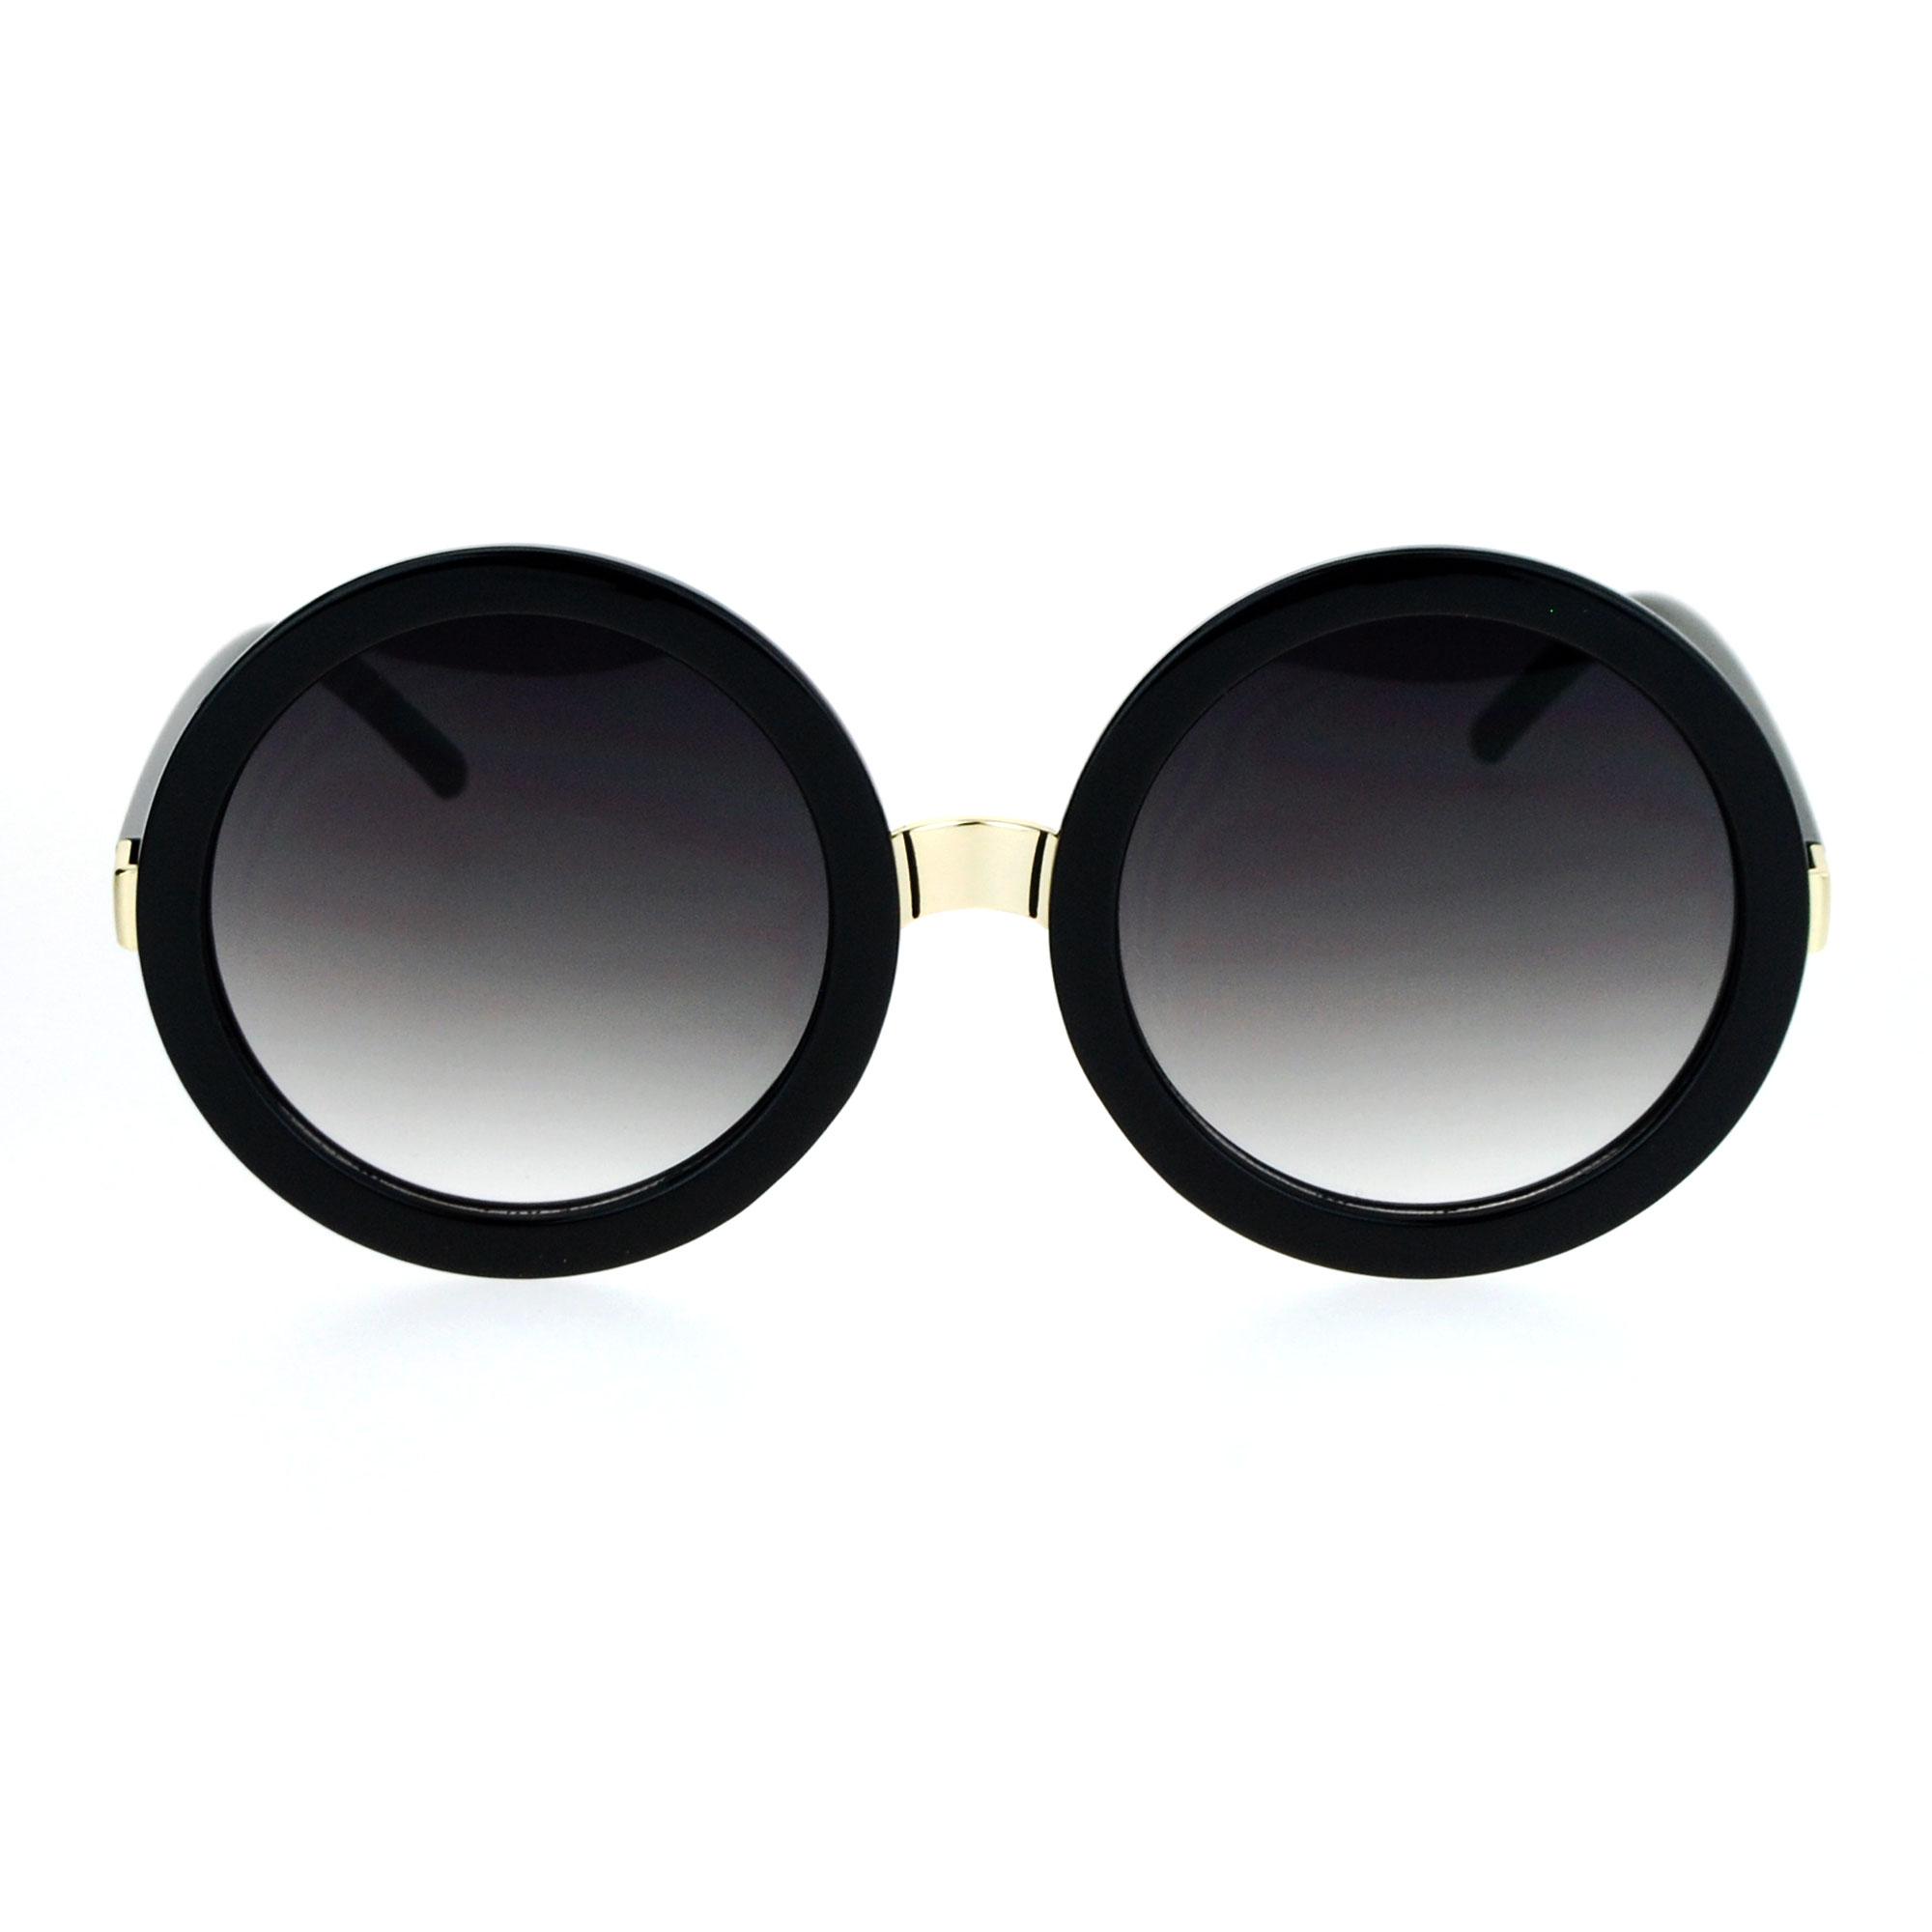 Round Circle Sunglasses  womens thick plastic round circle lens mod designer sunglasses ebay